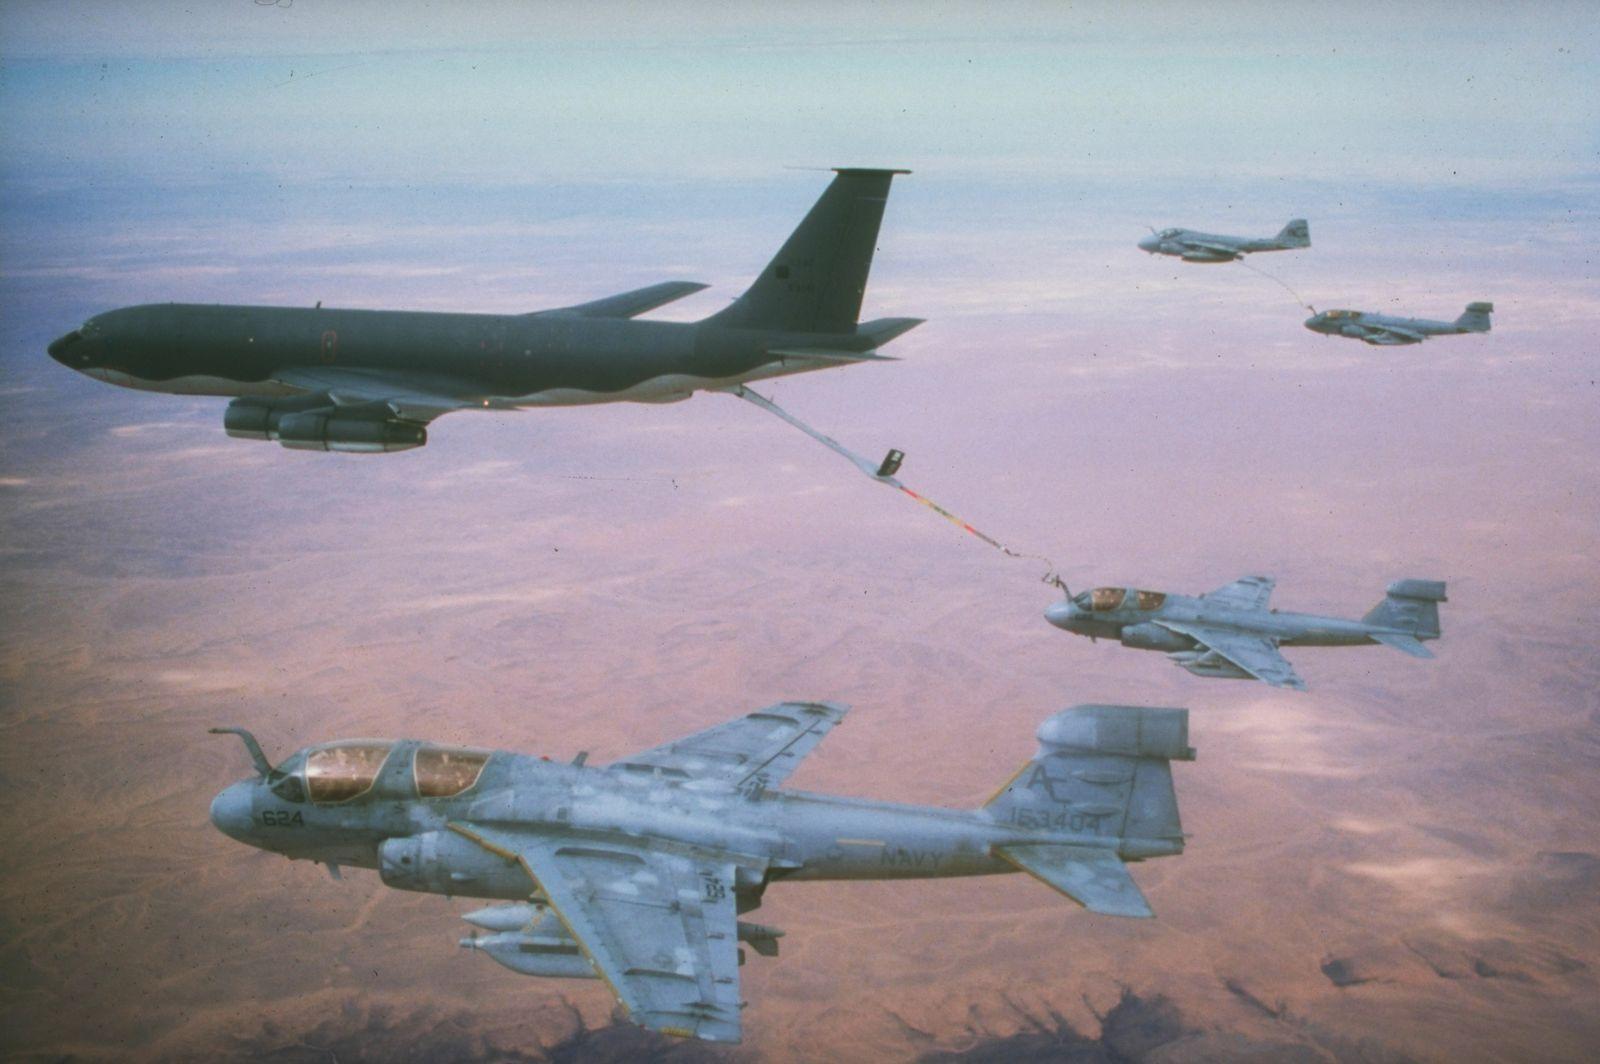 US Carrier Air Wing Three aircraft (sic